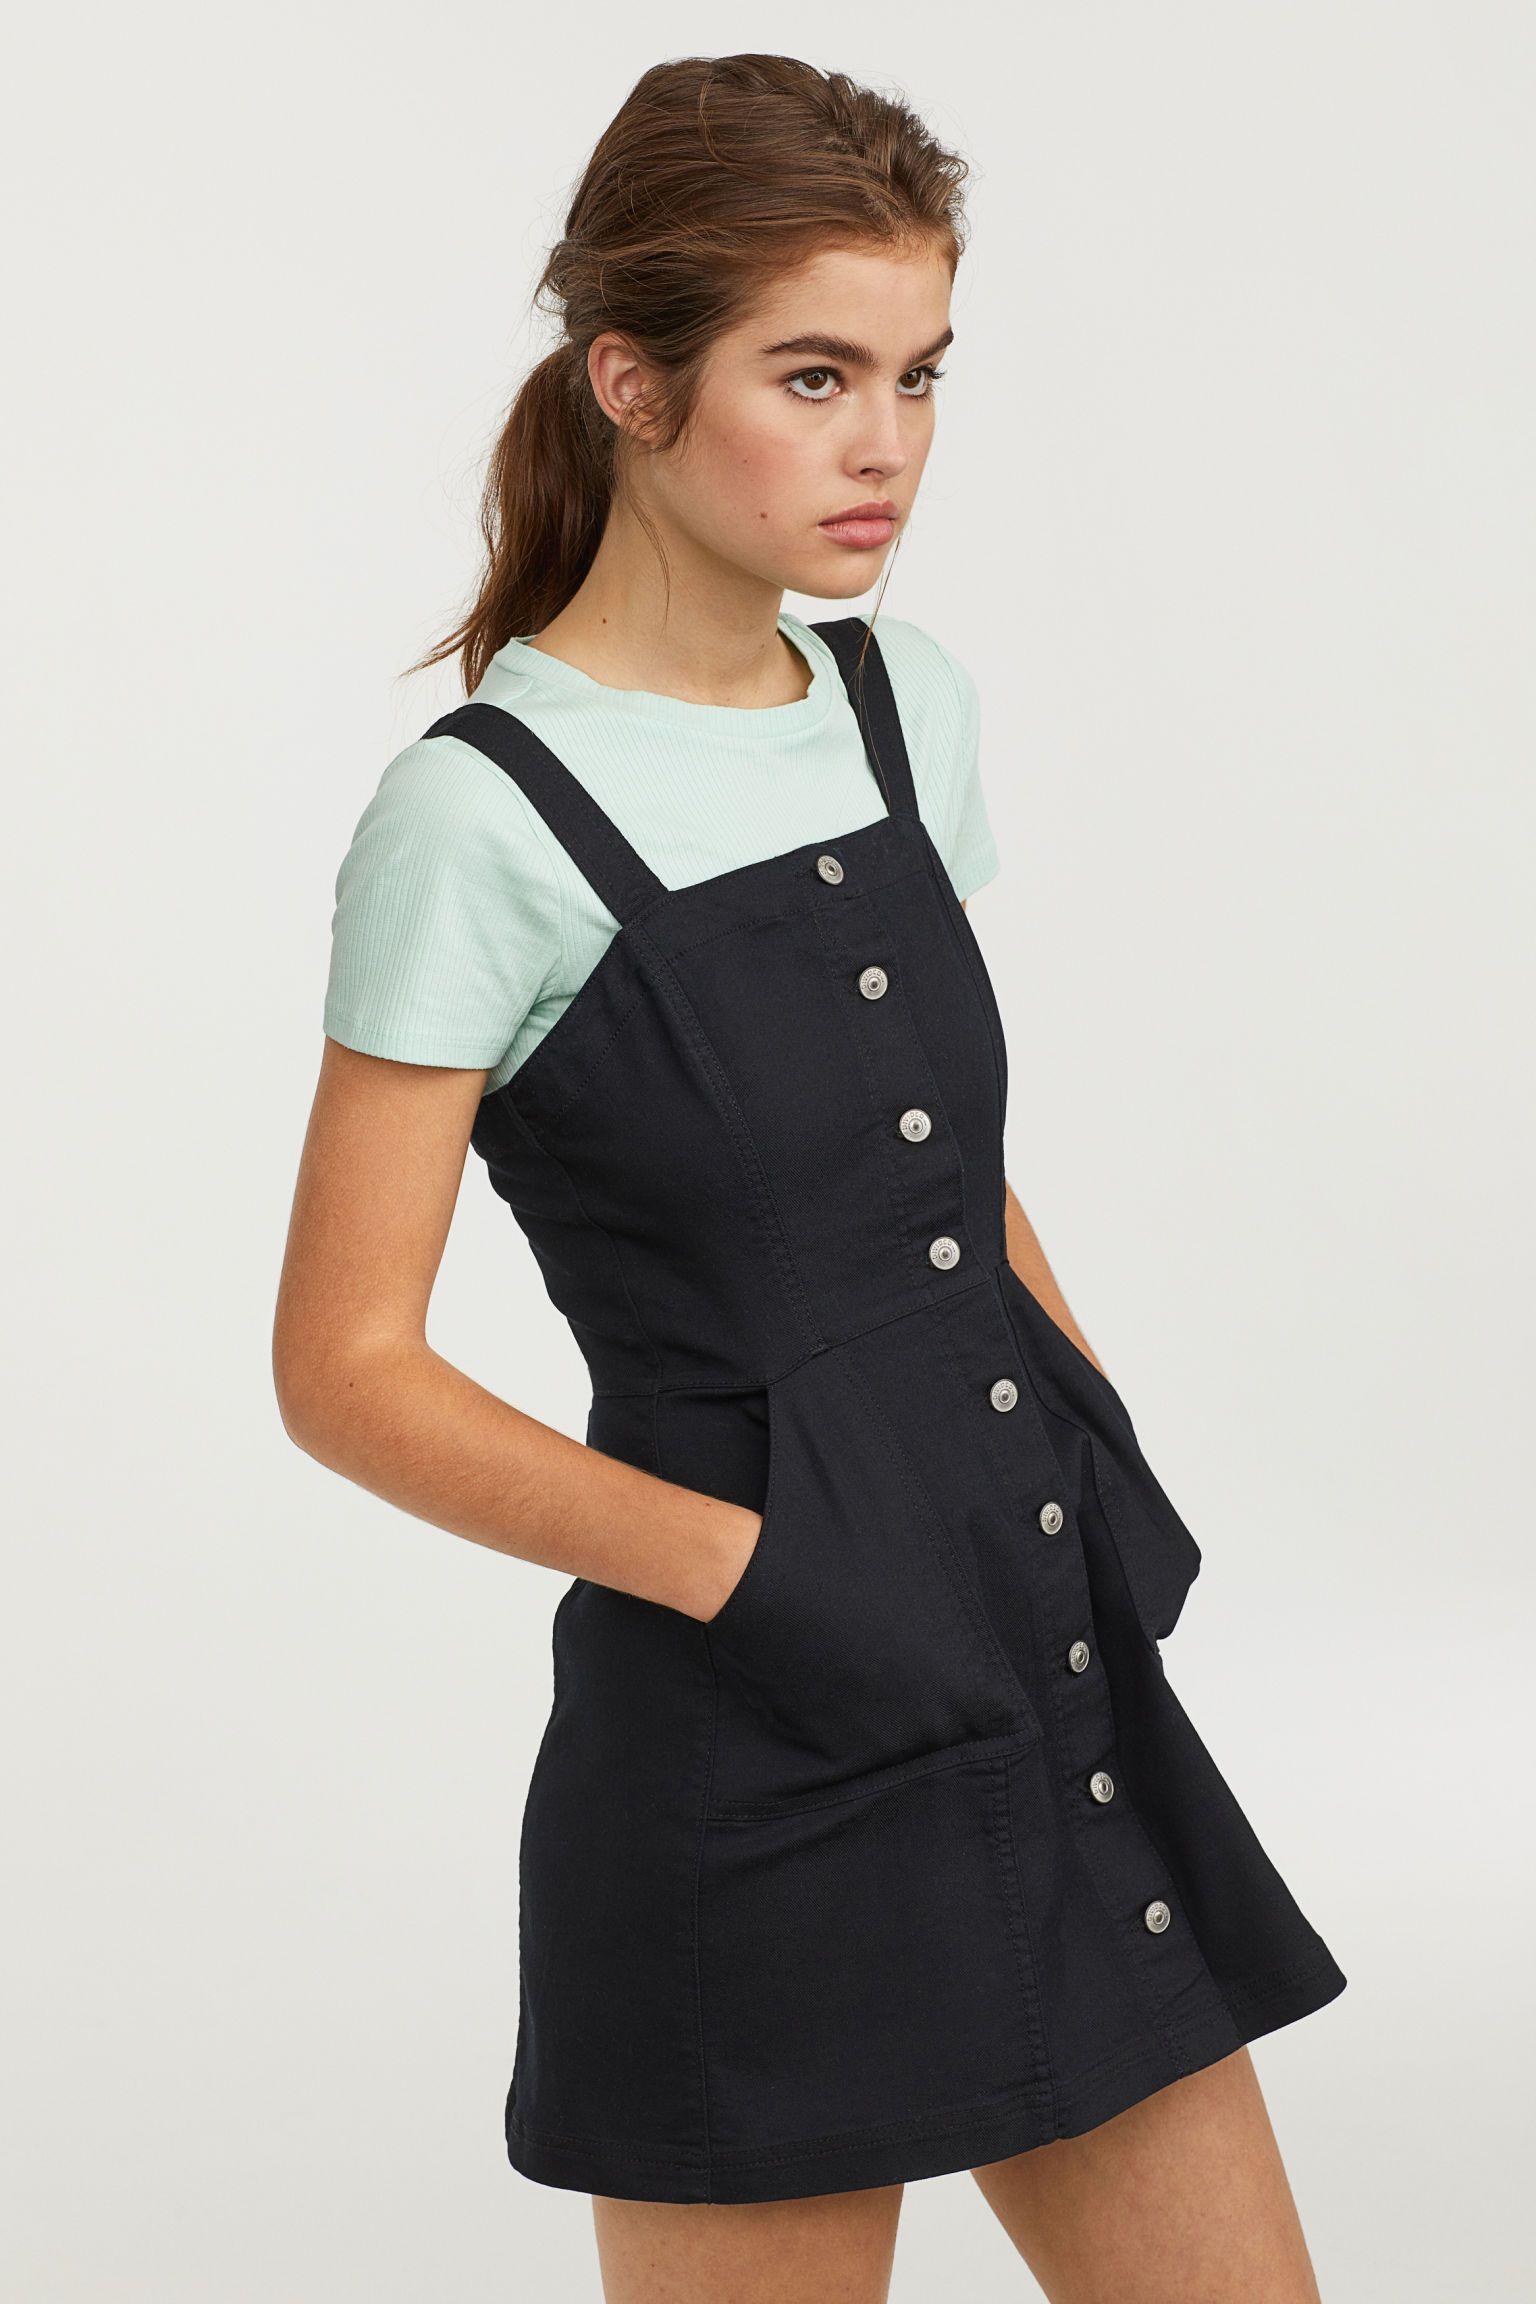 a705d83204 H M bib overall dress